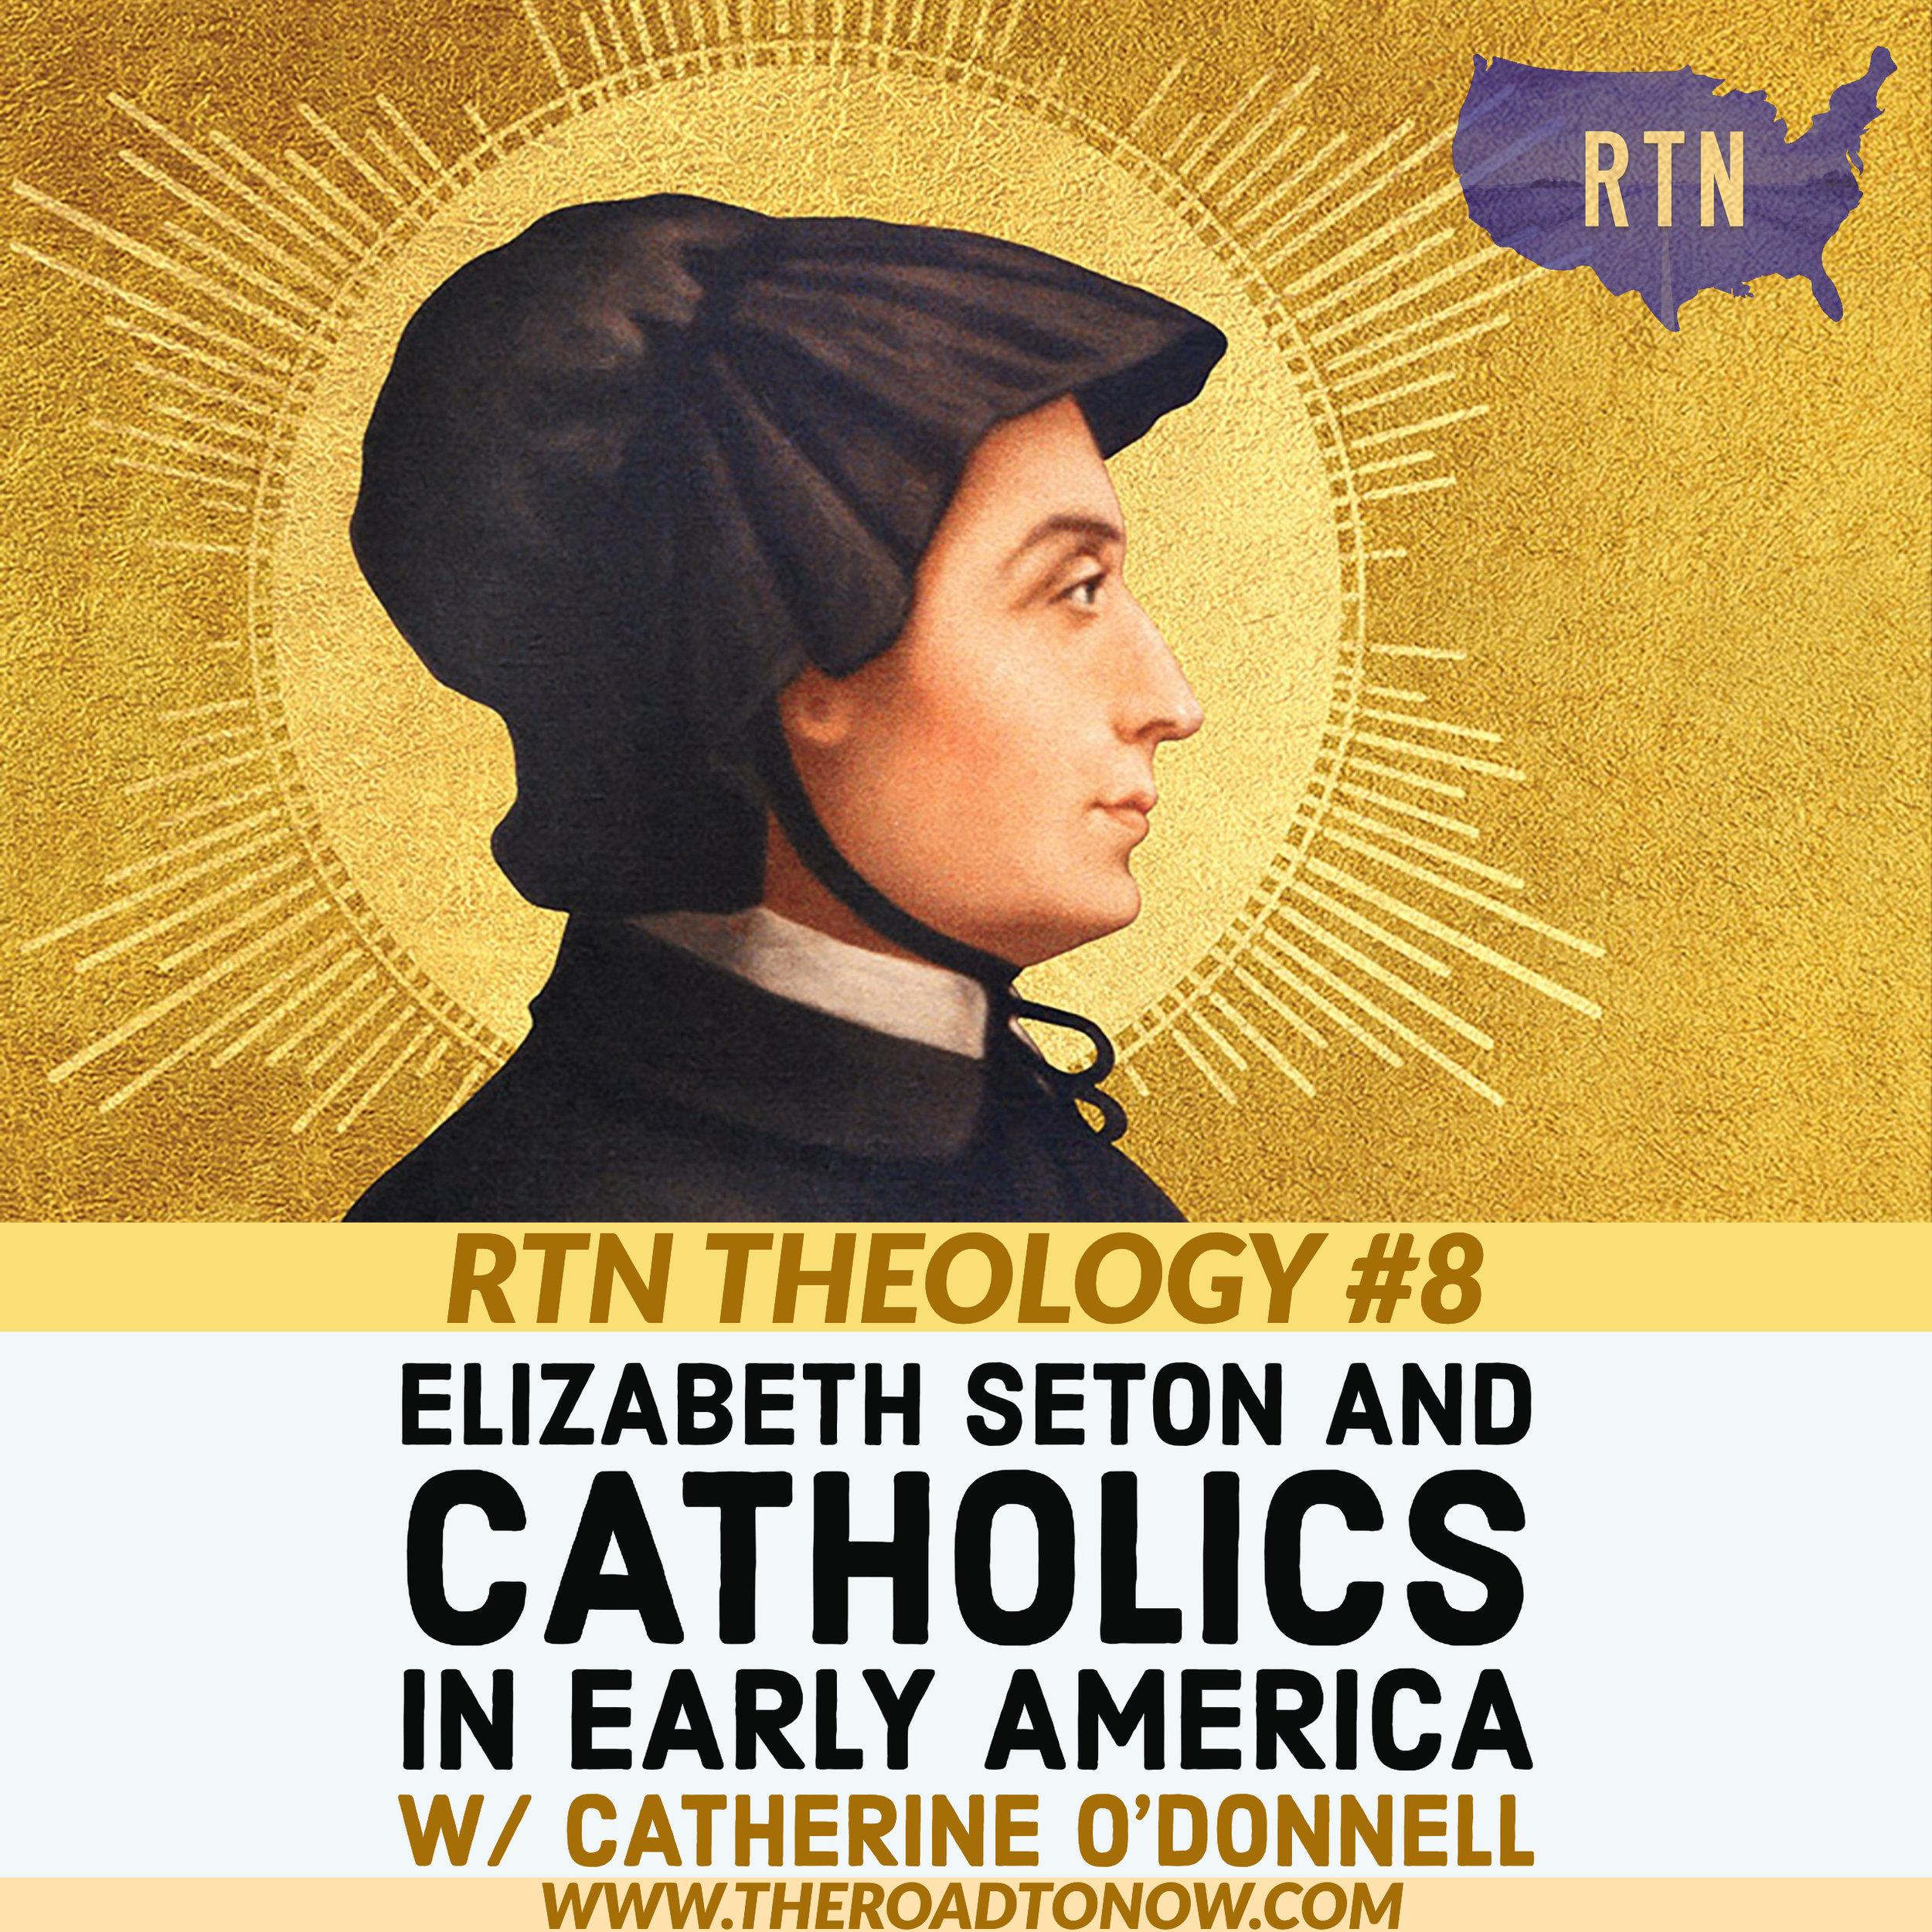 RTN THeology 8 Graphic.jpg